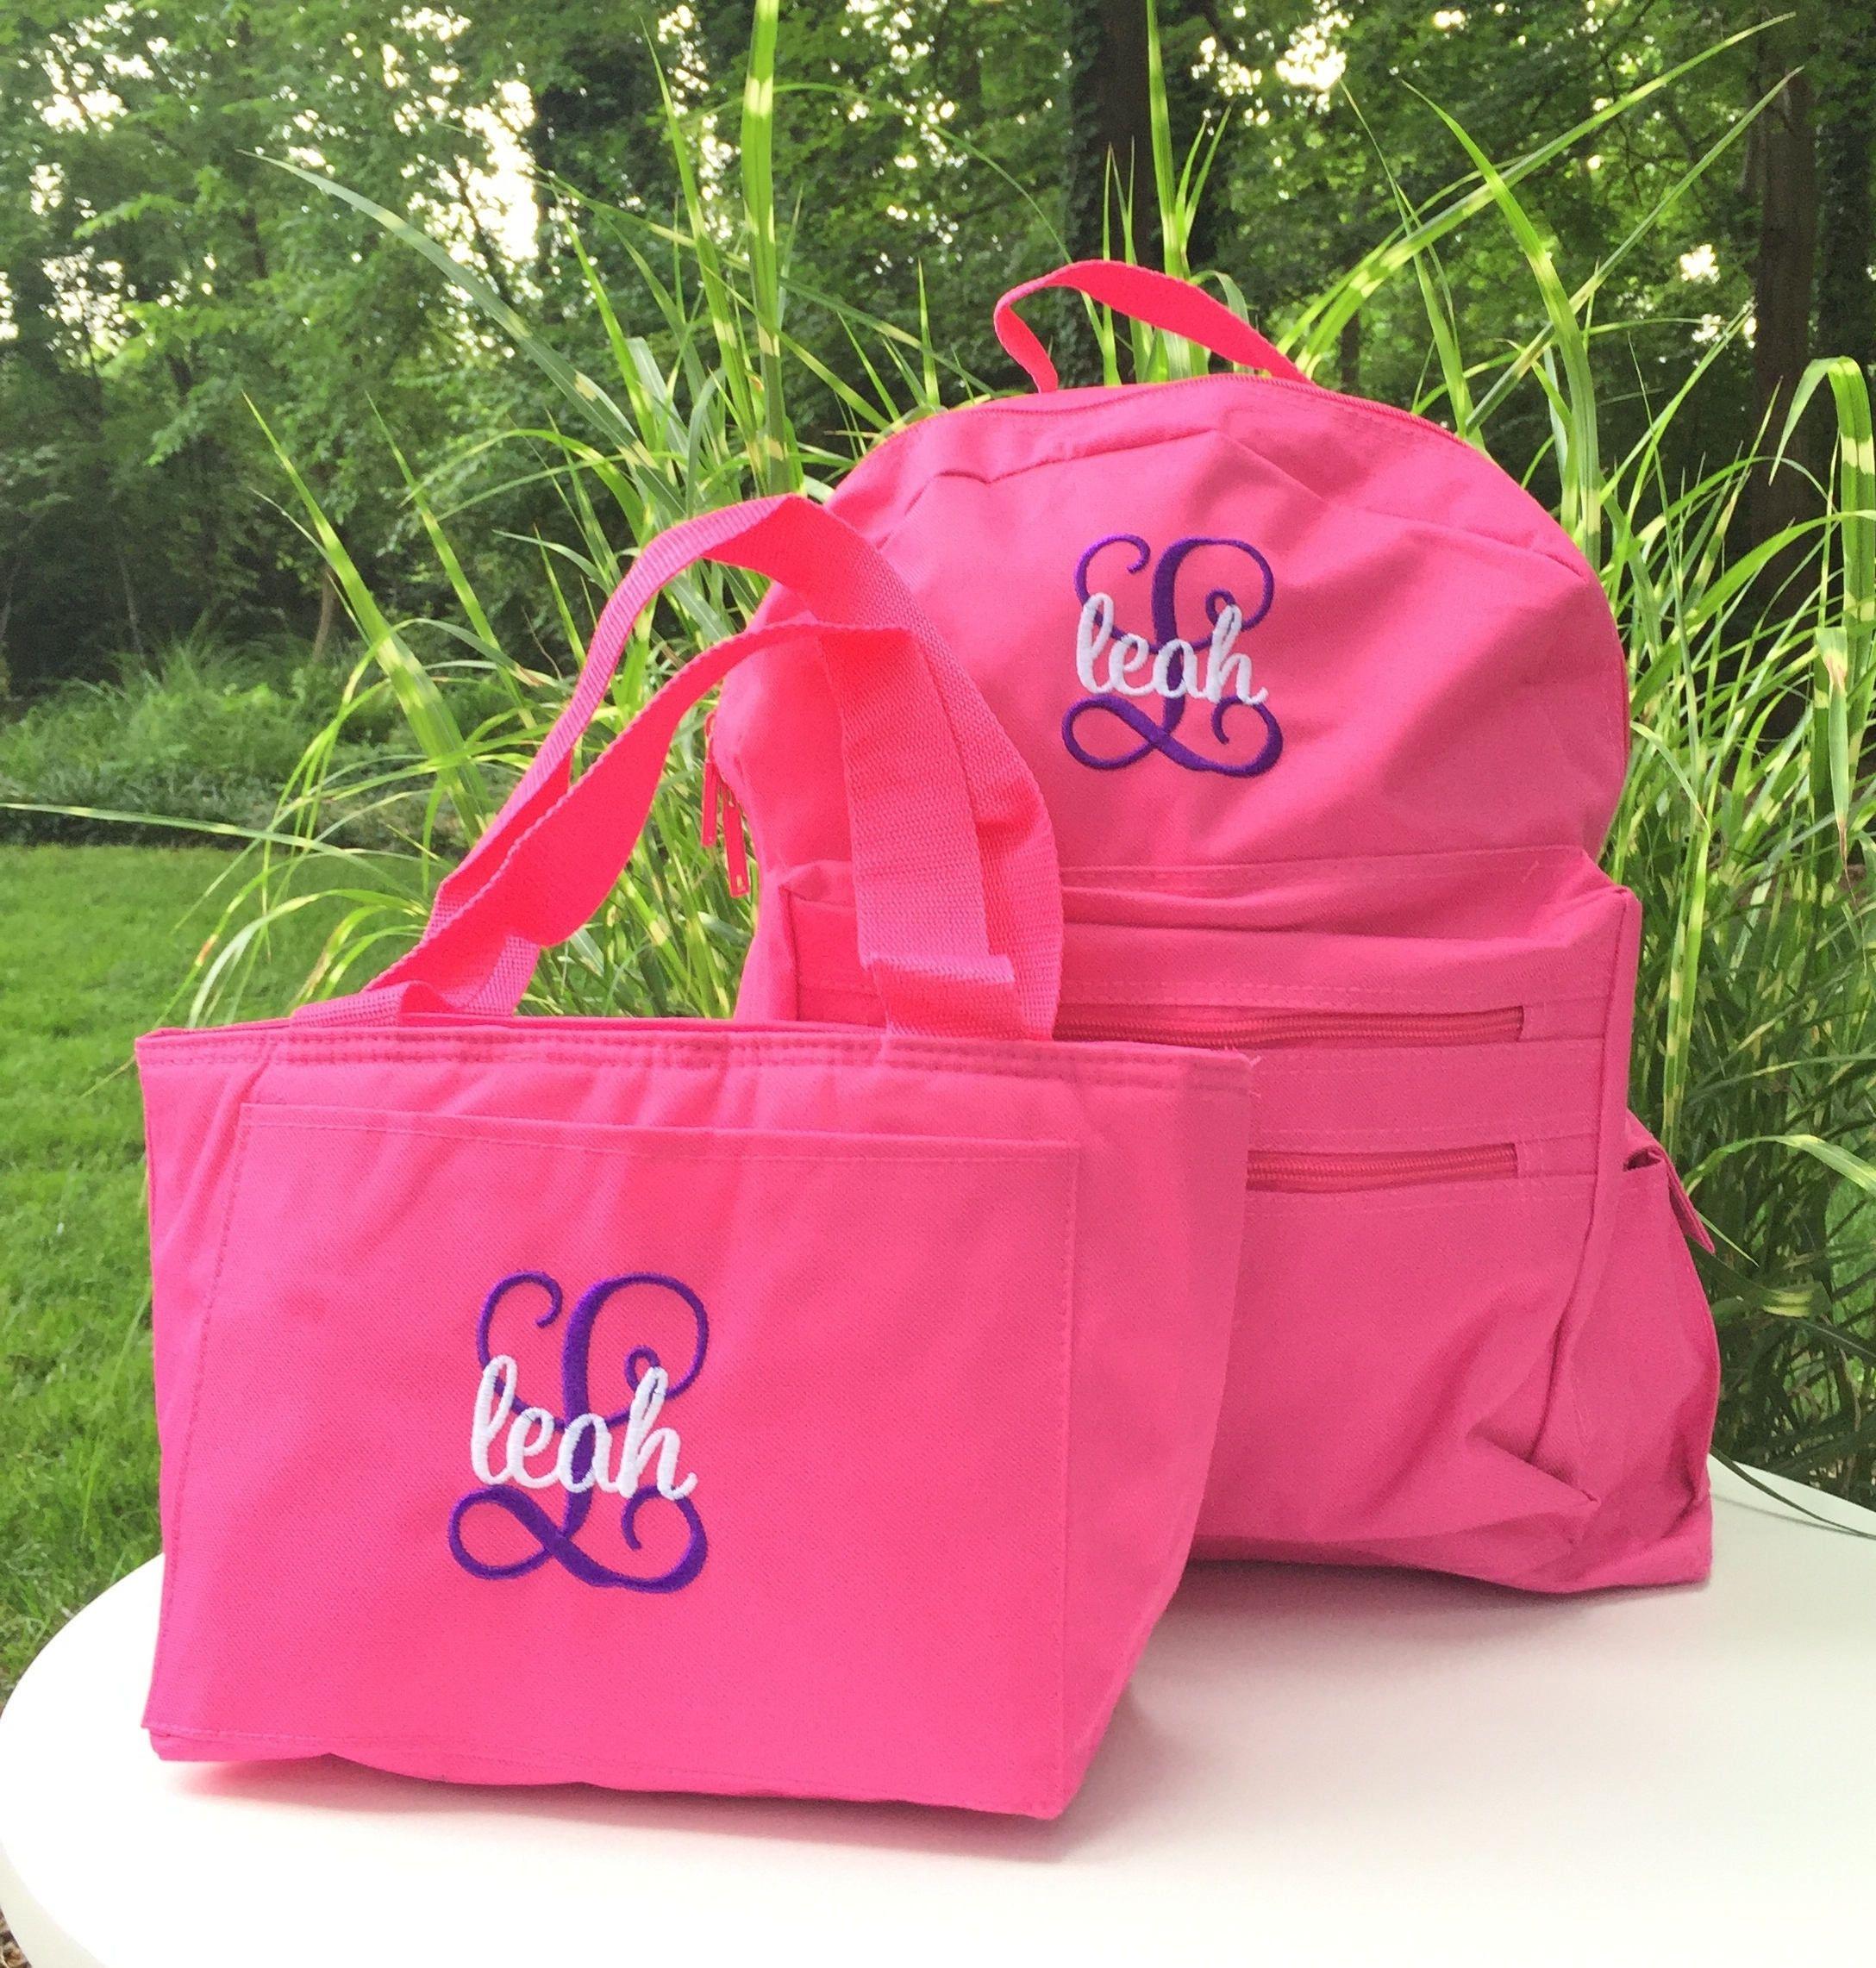 Personalized School Girls Back Pack - Monogrammed Backpack and Lunchbox - Book  Bag - Kids Children - Lunch Tote - Kid Back Pack - Child Bag by MJMonograms  ... 4a5409e9ef1c1